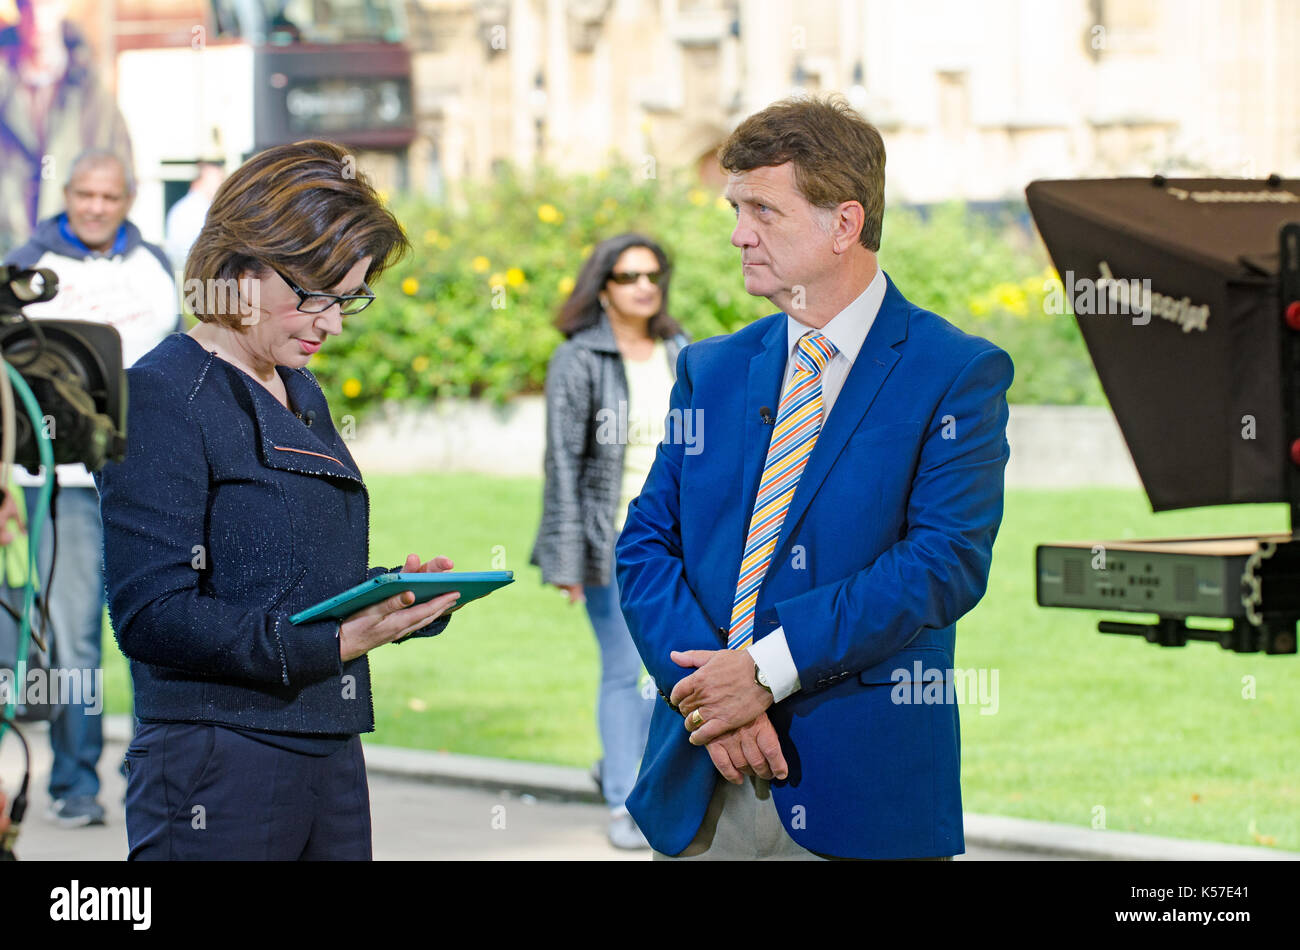 Gerard Batten MEP (UKIP: London) UKIP Brexit spokesman, interviewed by BBC's Jane Hill on College Green, Westminster, Stock Photo